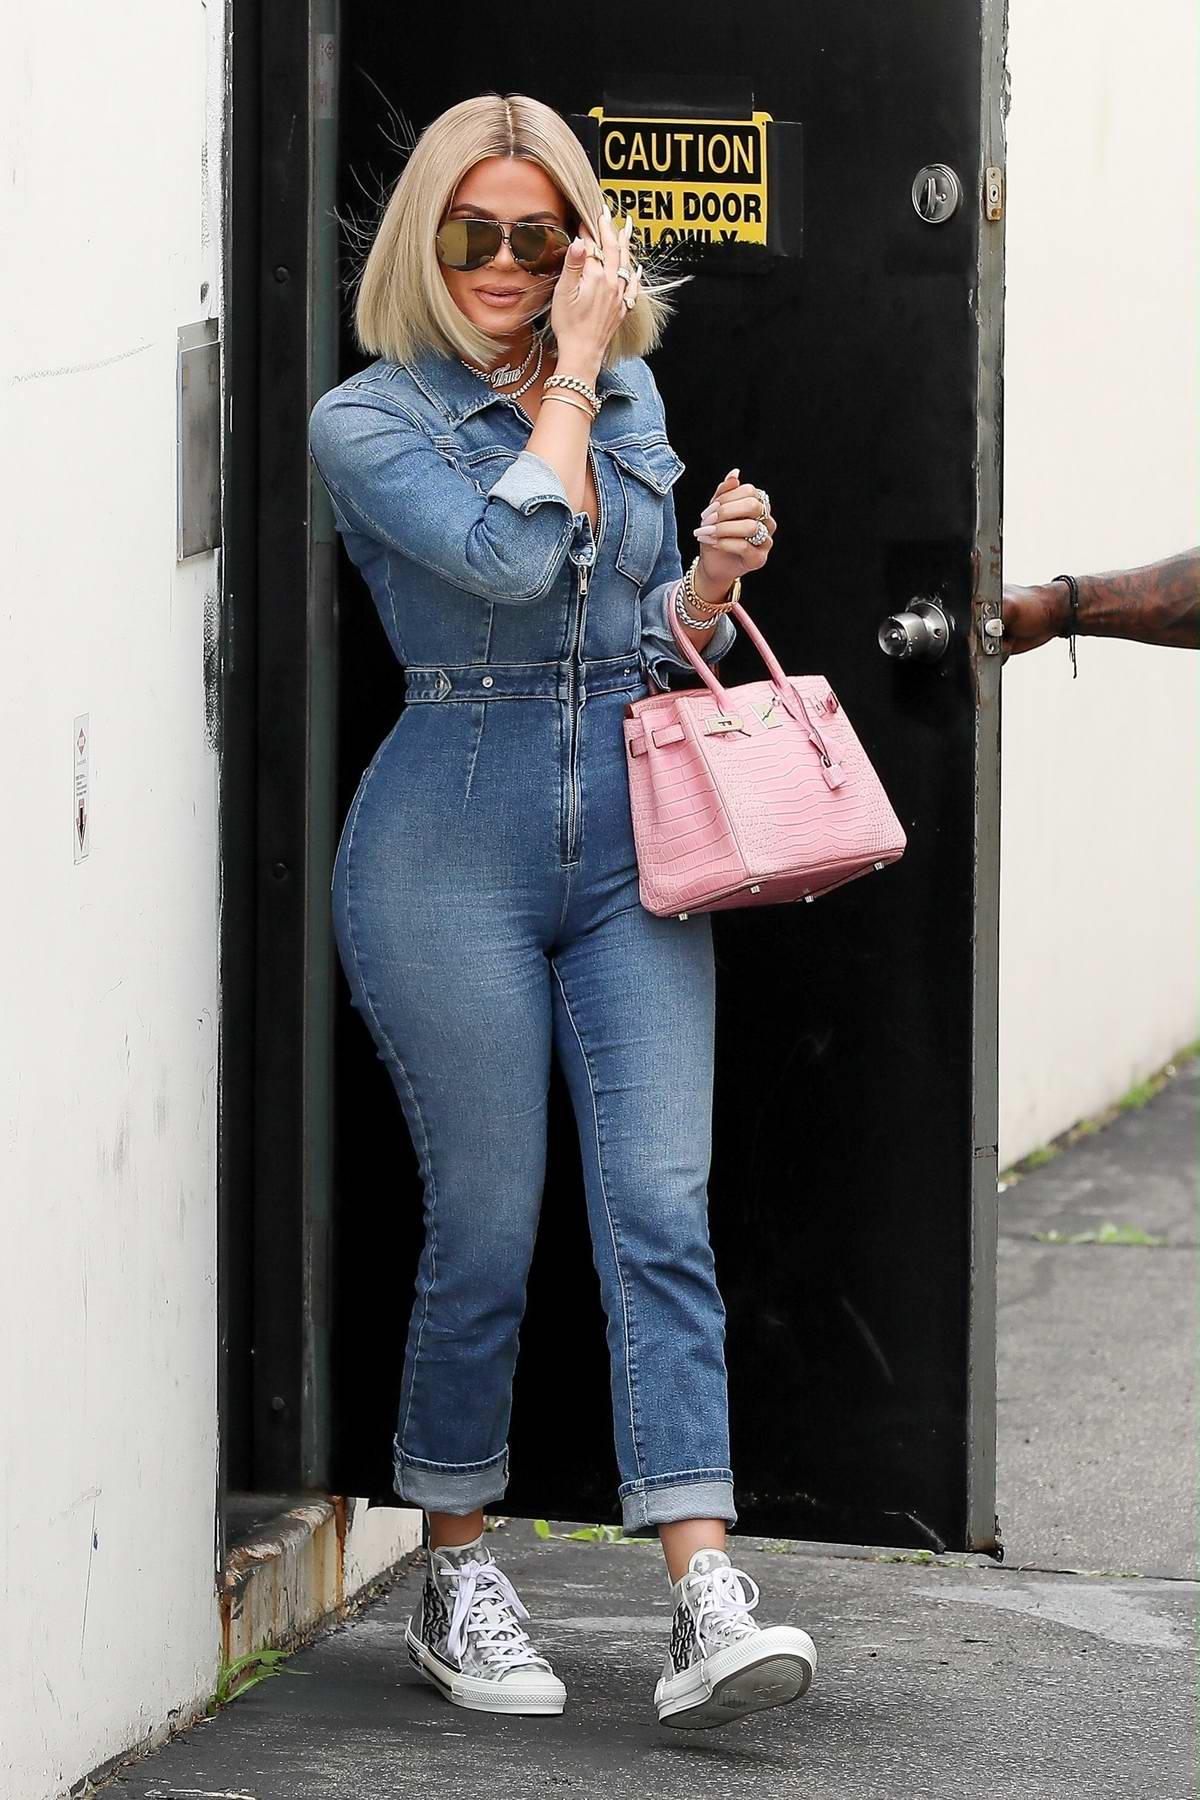 Khloe Kardashian flaunts her curves in a denim jumpsuit as she leaves a studio in Woodland Hills, California